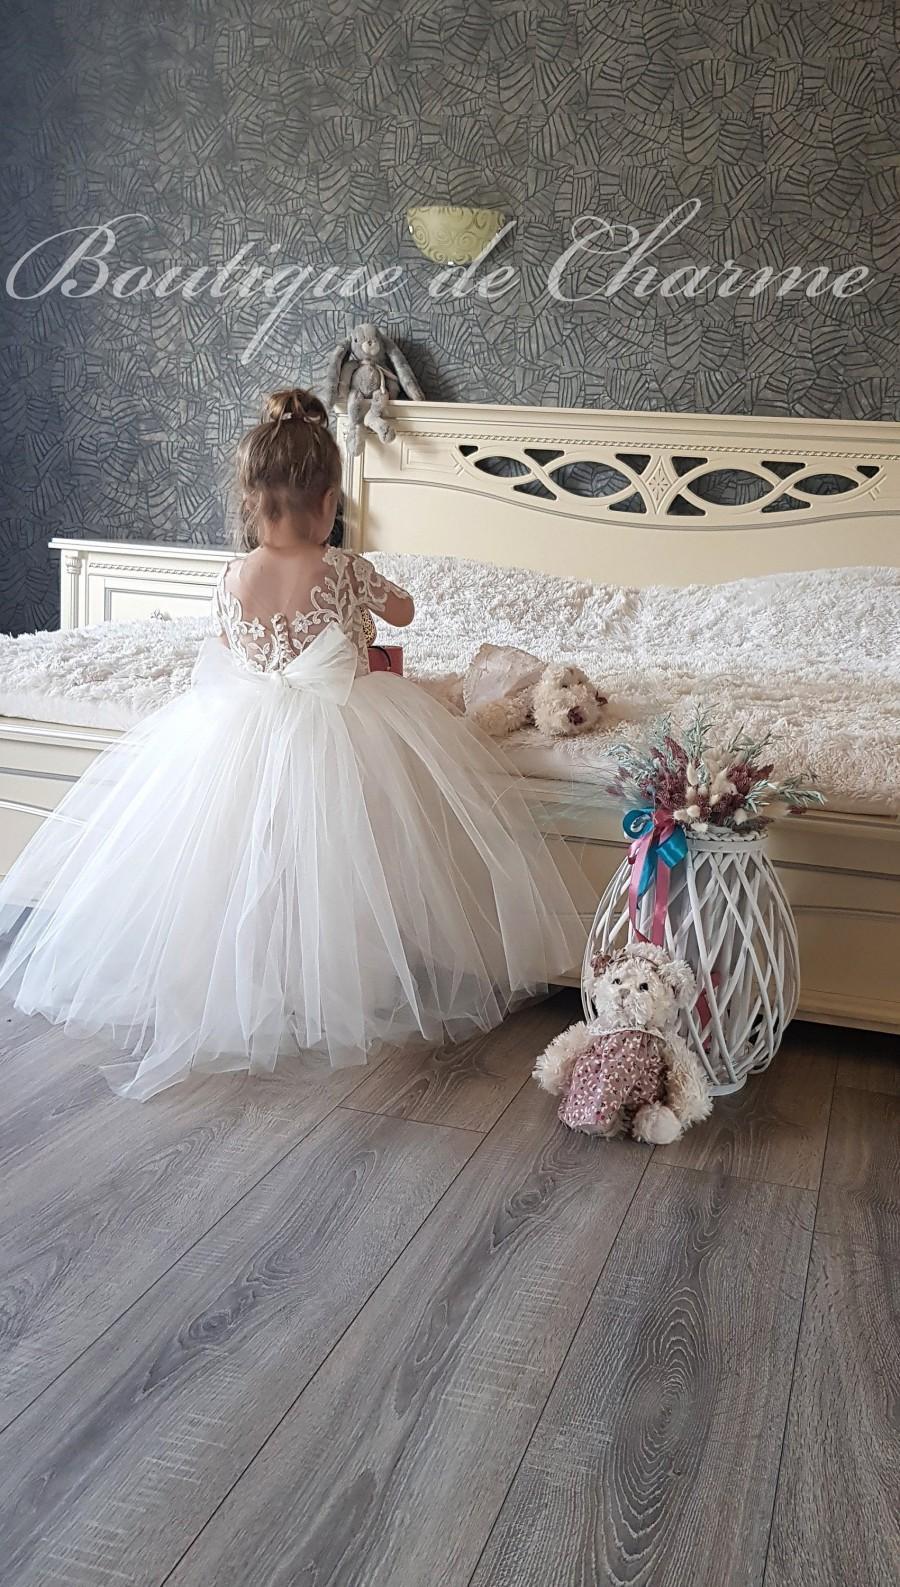 Wedding - Baby wedding dress, White lace flower girl dress, Toddler formal dress, Communion dress, Flower girl dress train,Tulle girl dress,Tutu dress